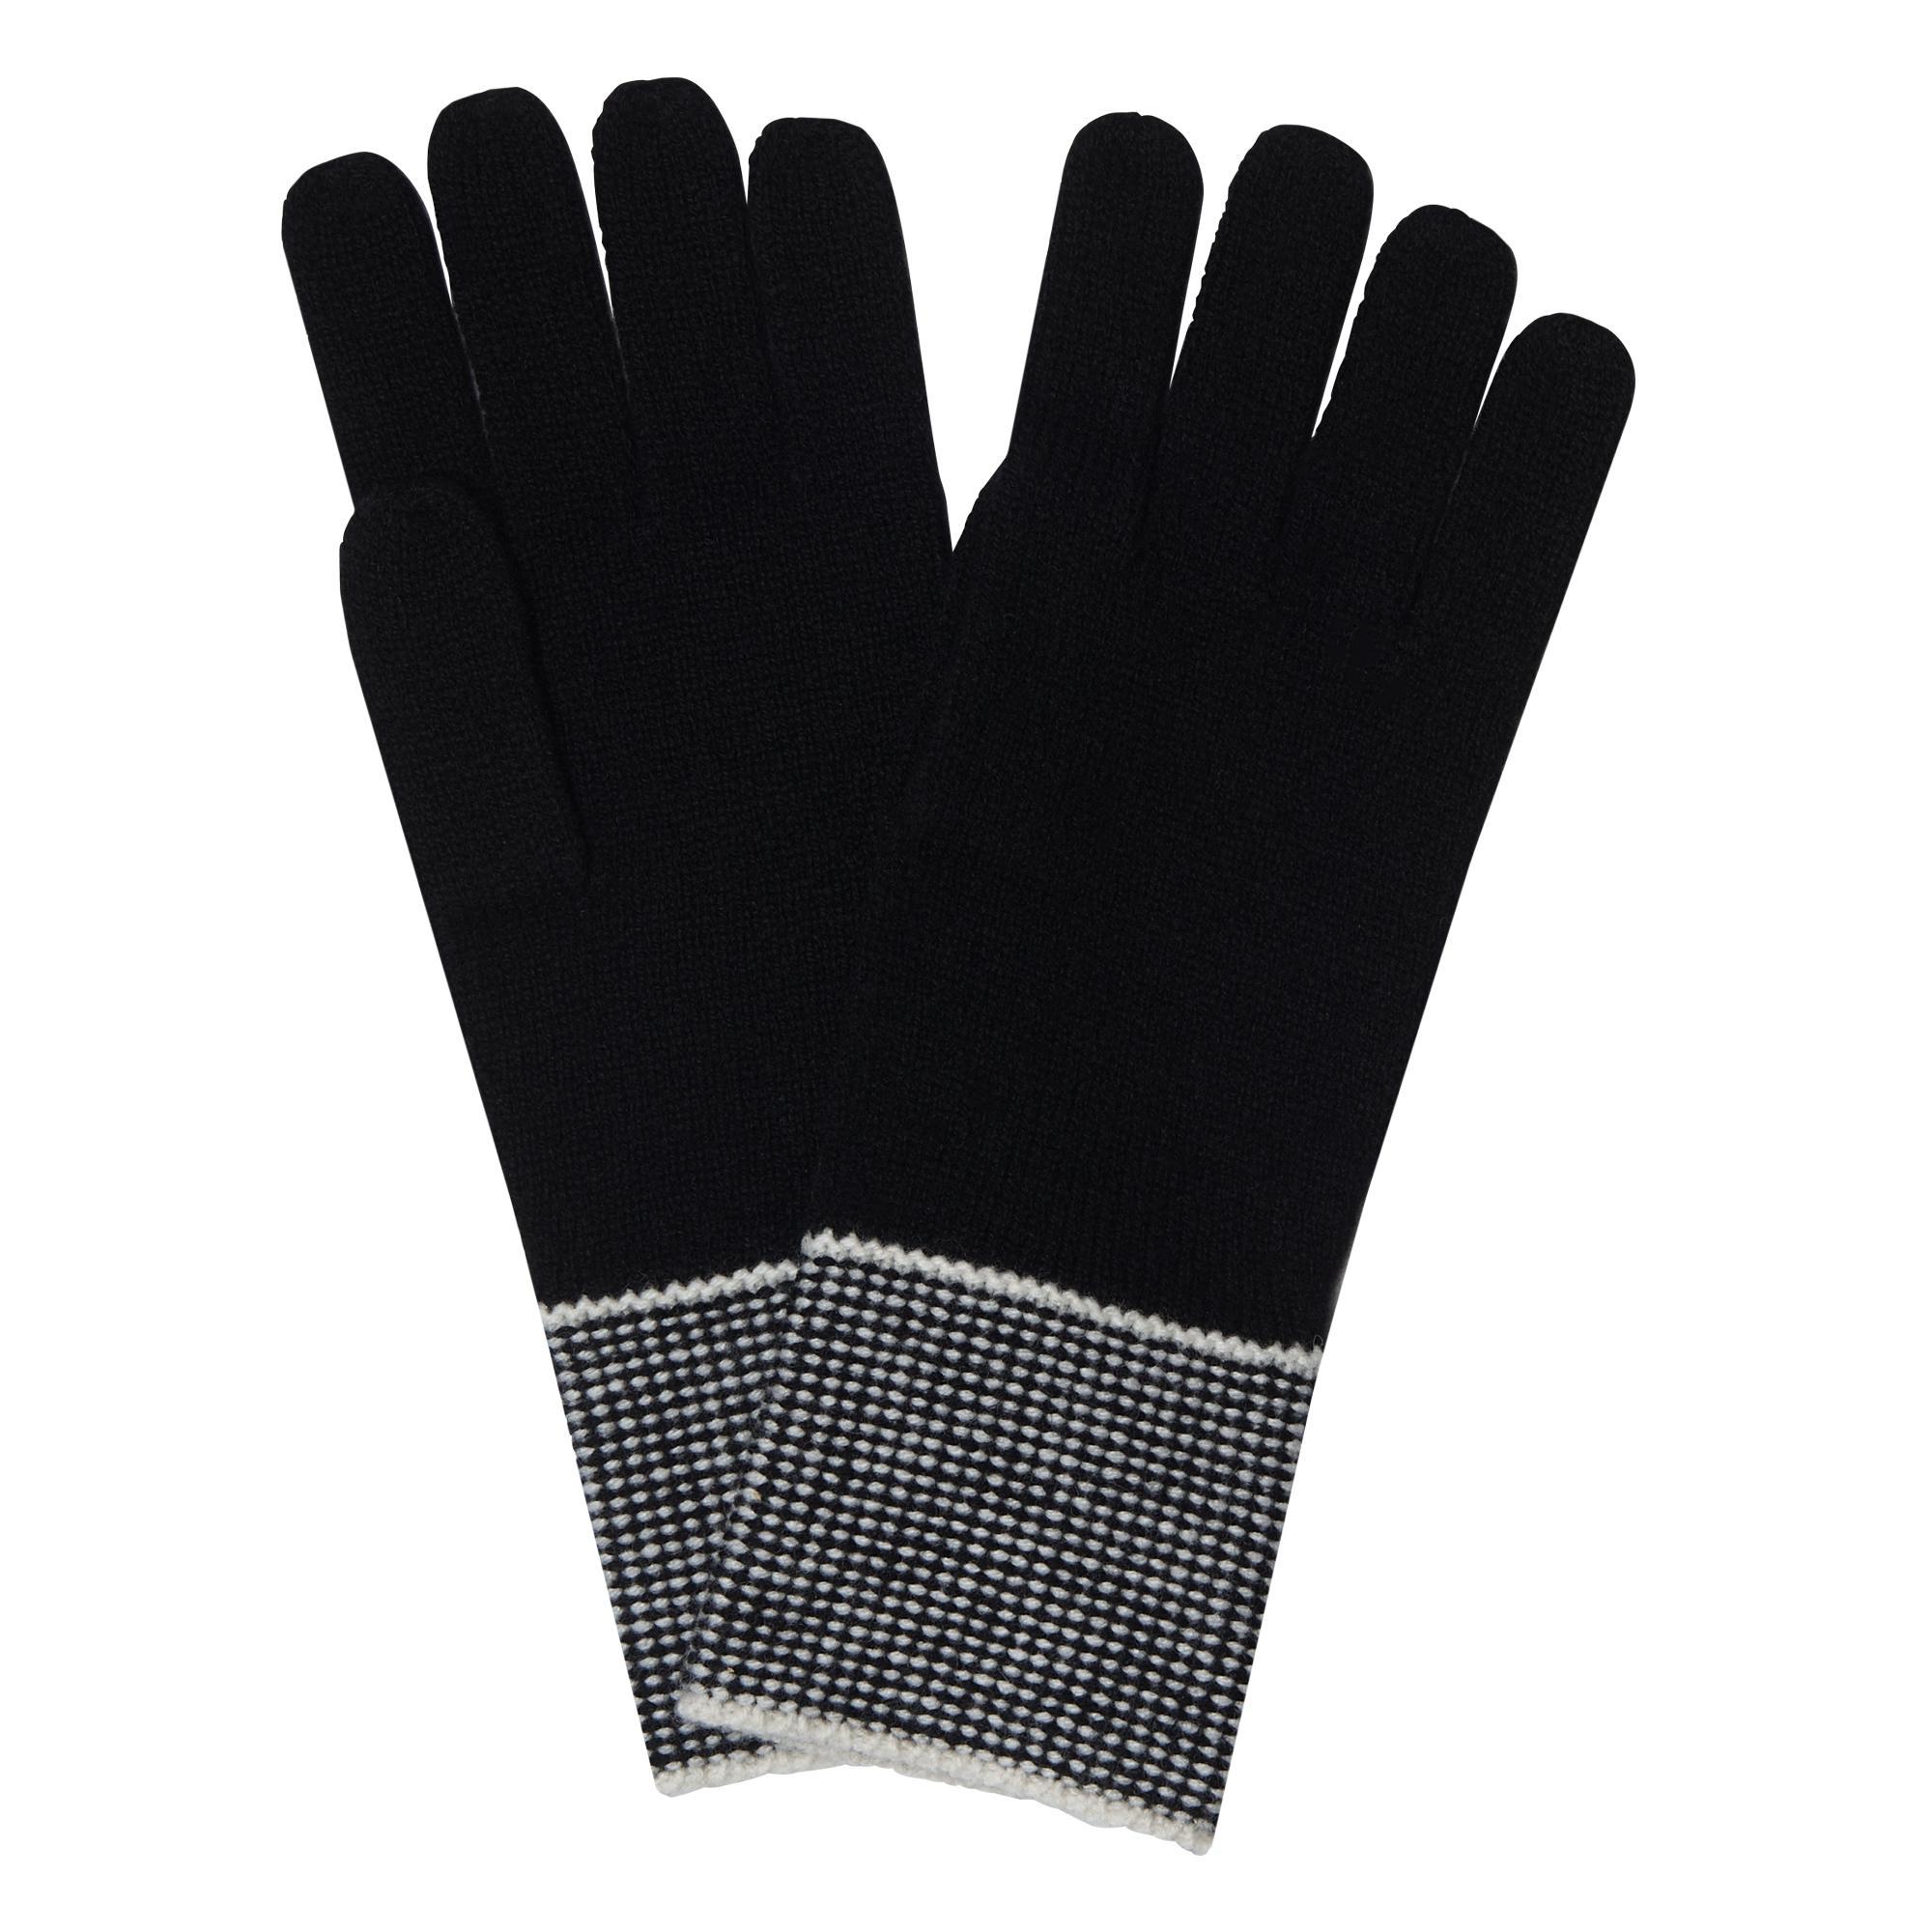 Tone Gloves